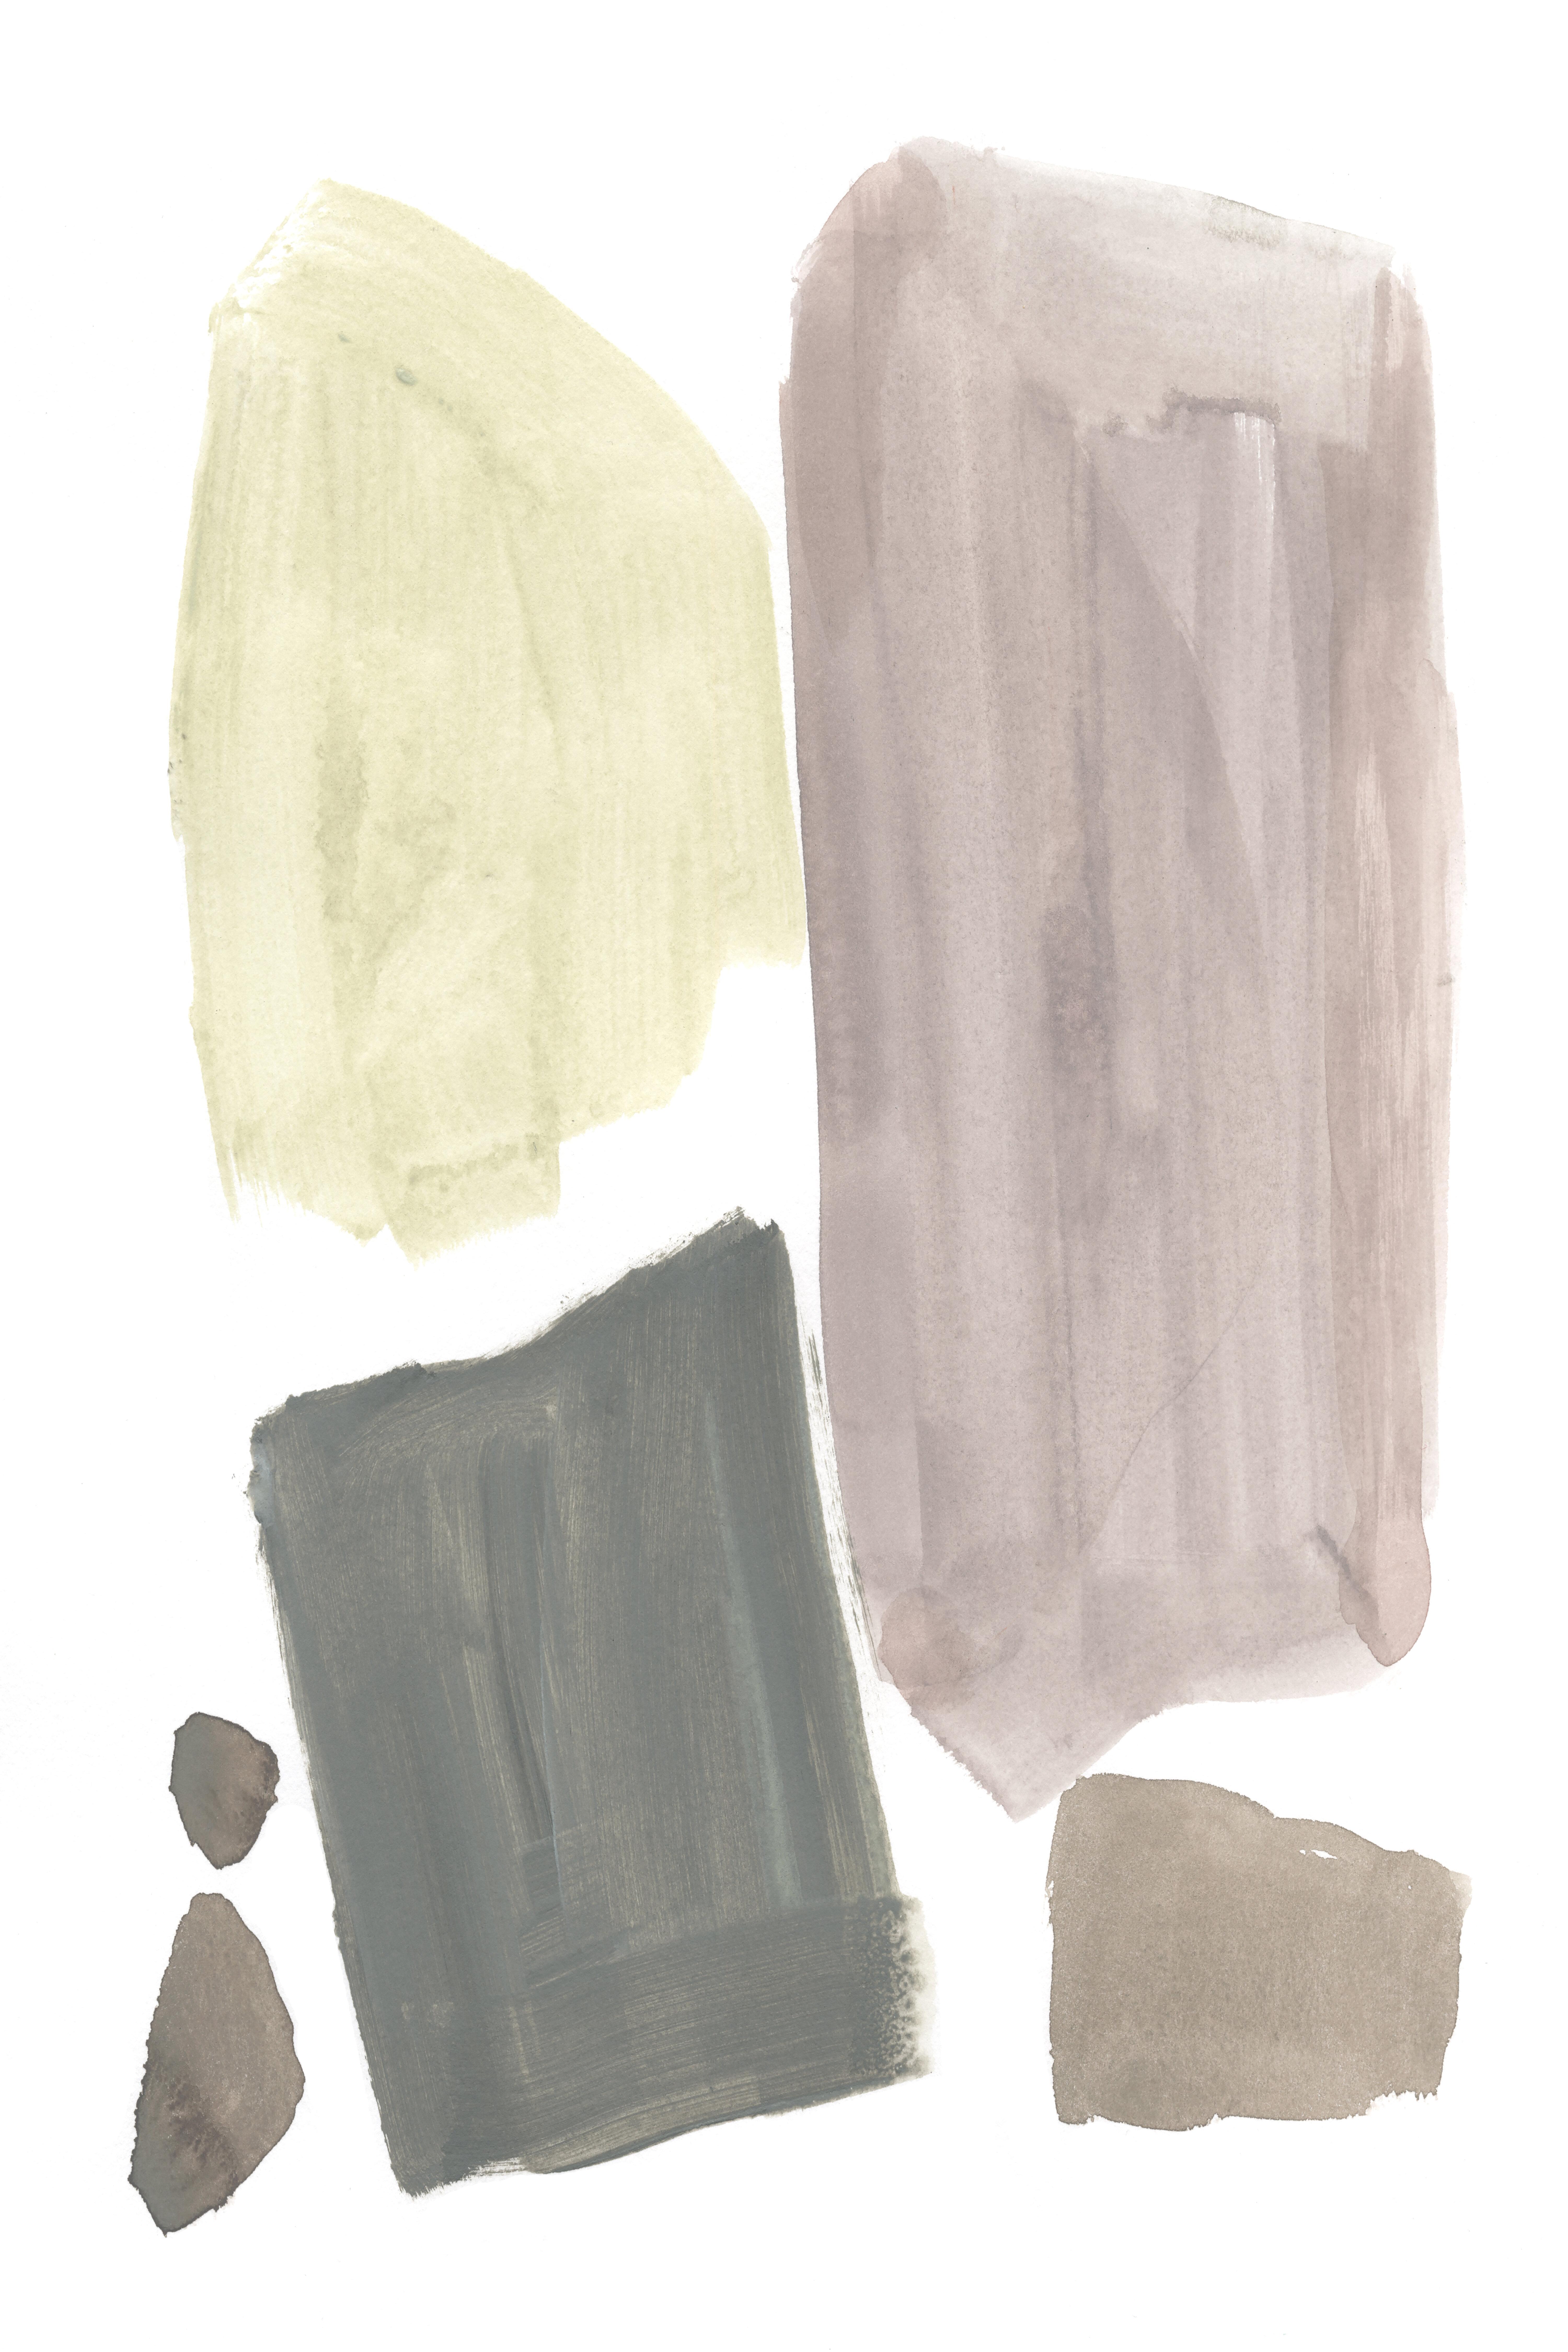 Blue Elephant Muted Mod Shapes Iv By Jennifer Goldberger Wrapped Canvas Painting Print Wayfair Co Uk